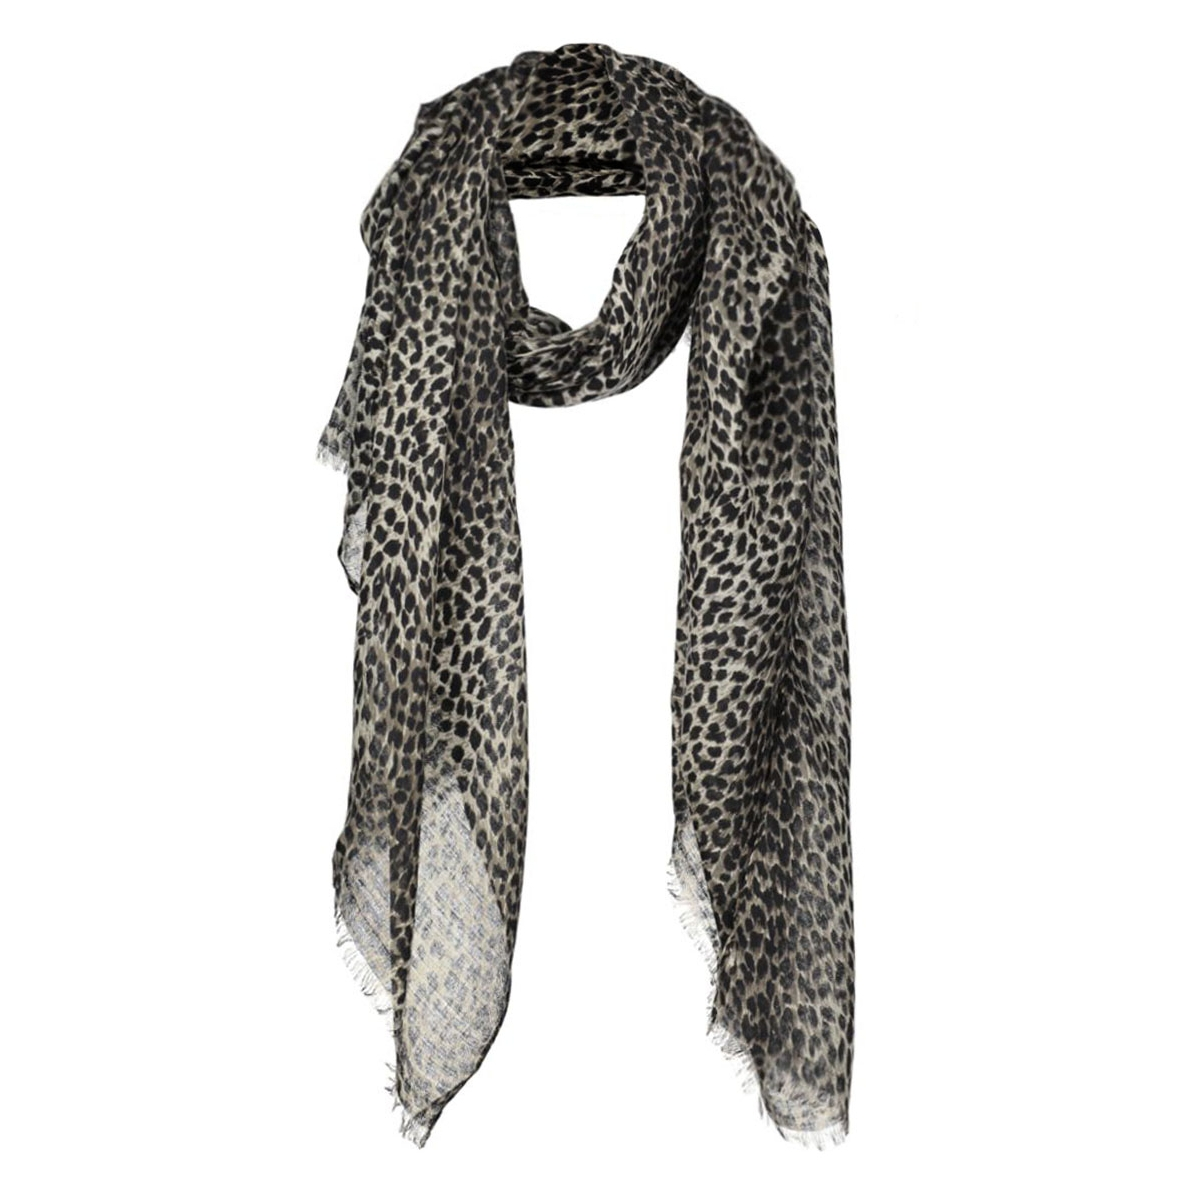 pcelfrida long scarf air 17080412 pieces sjaal khaki green